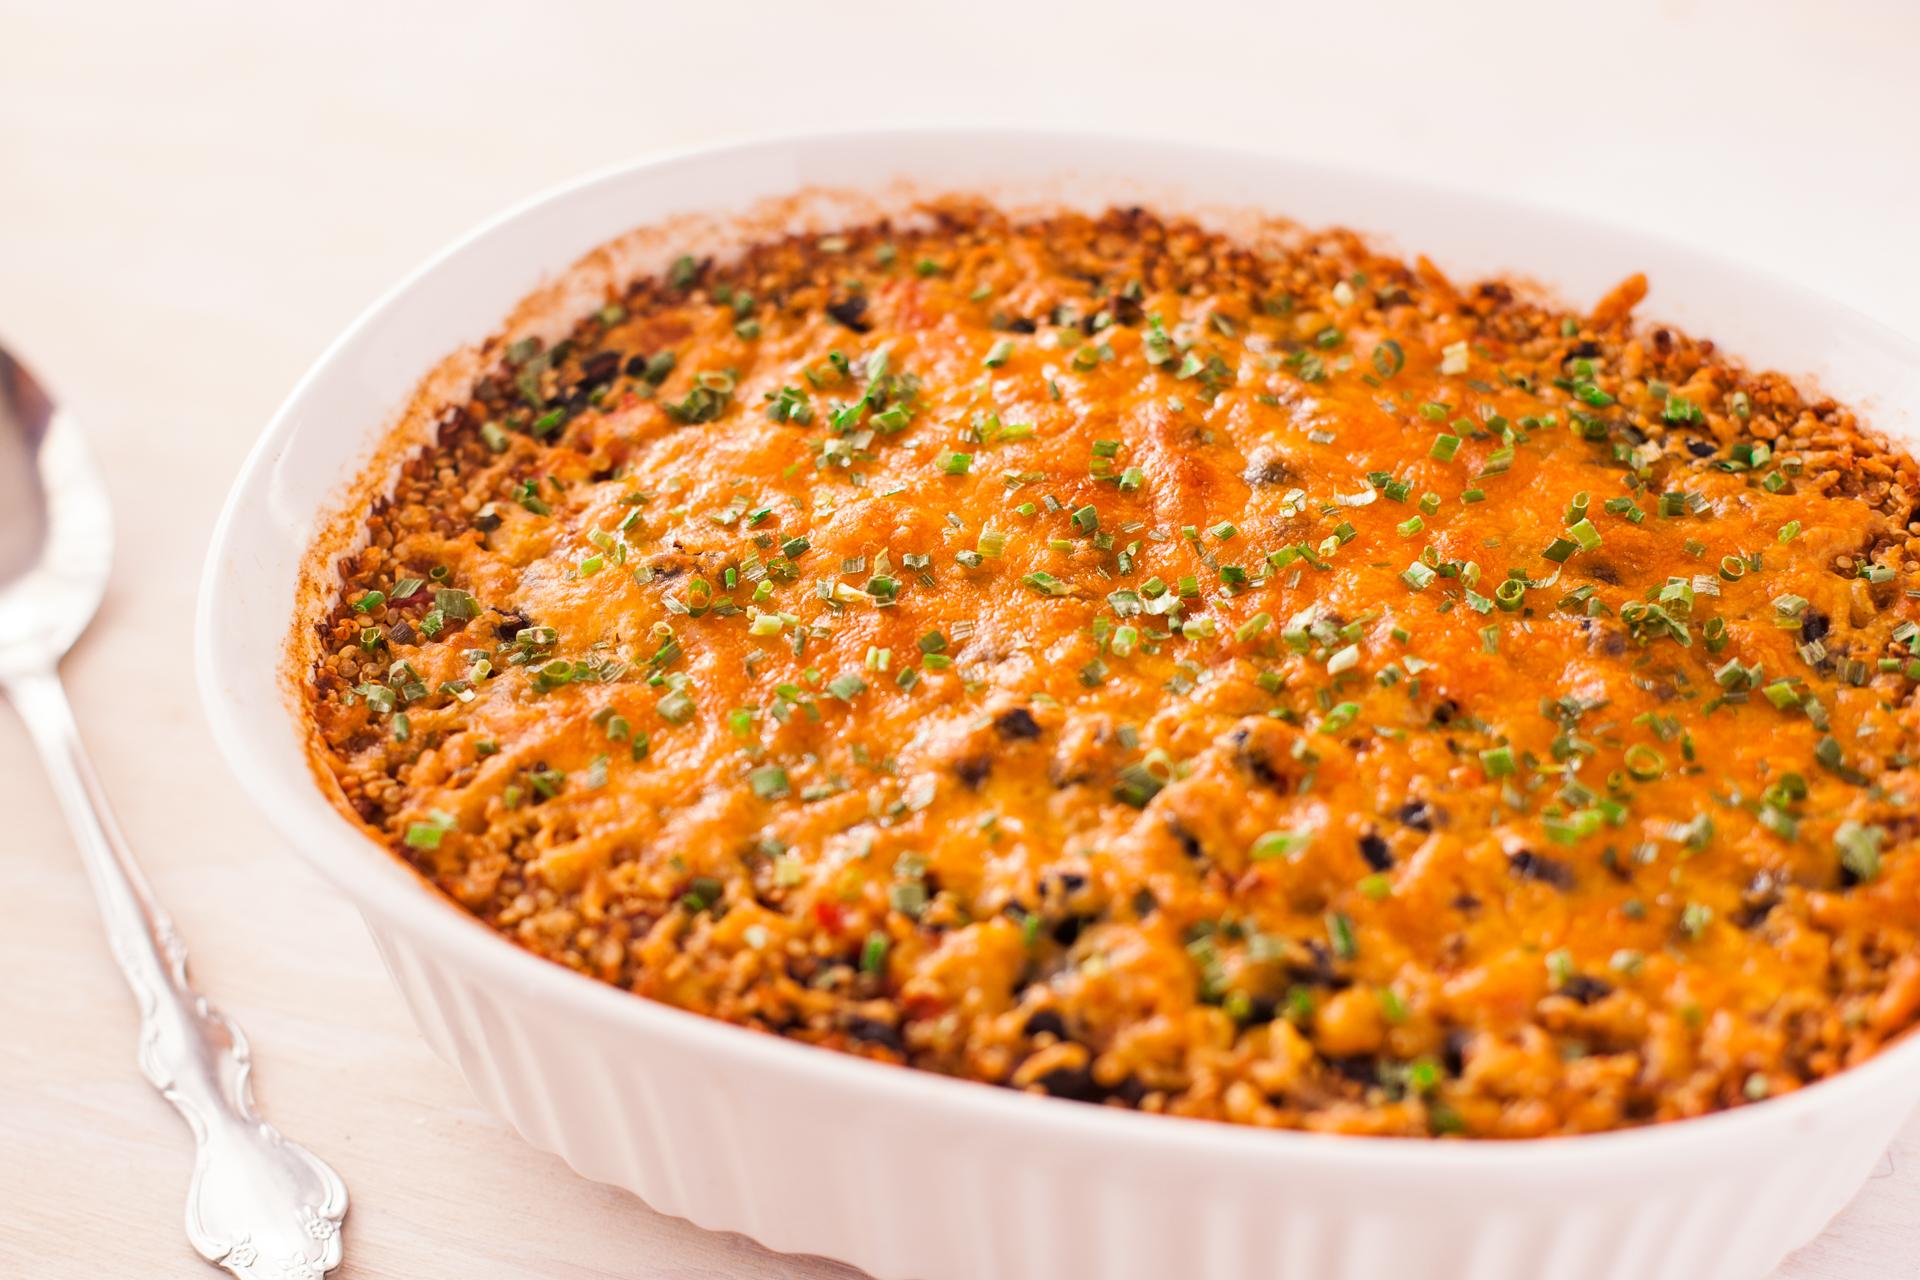 Southwestern Quinoa Vegetable Casserole